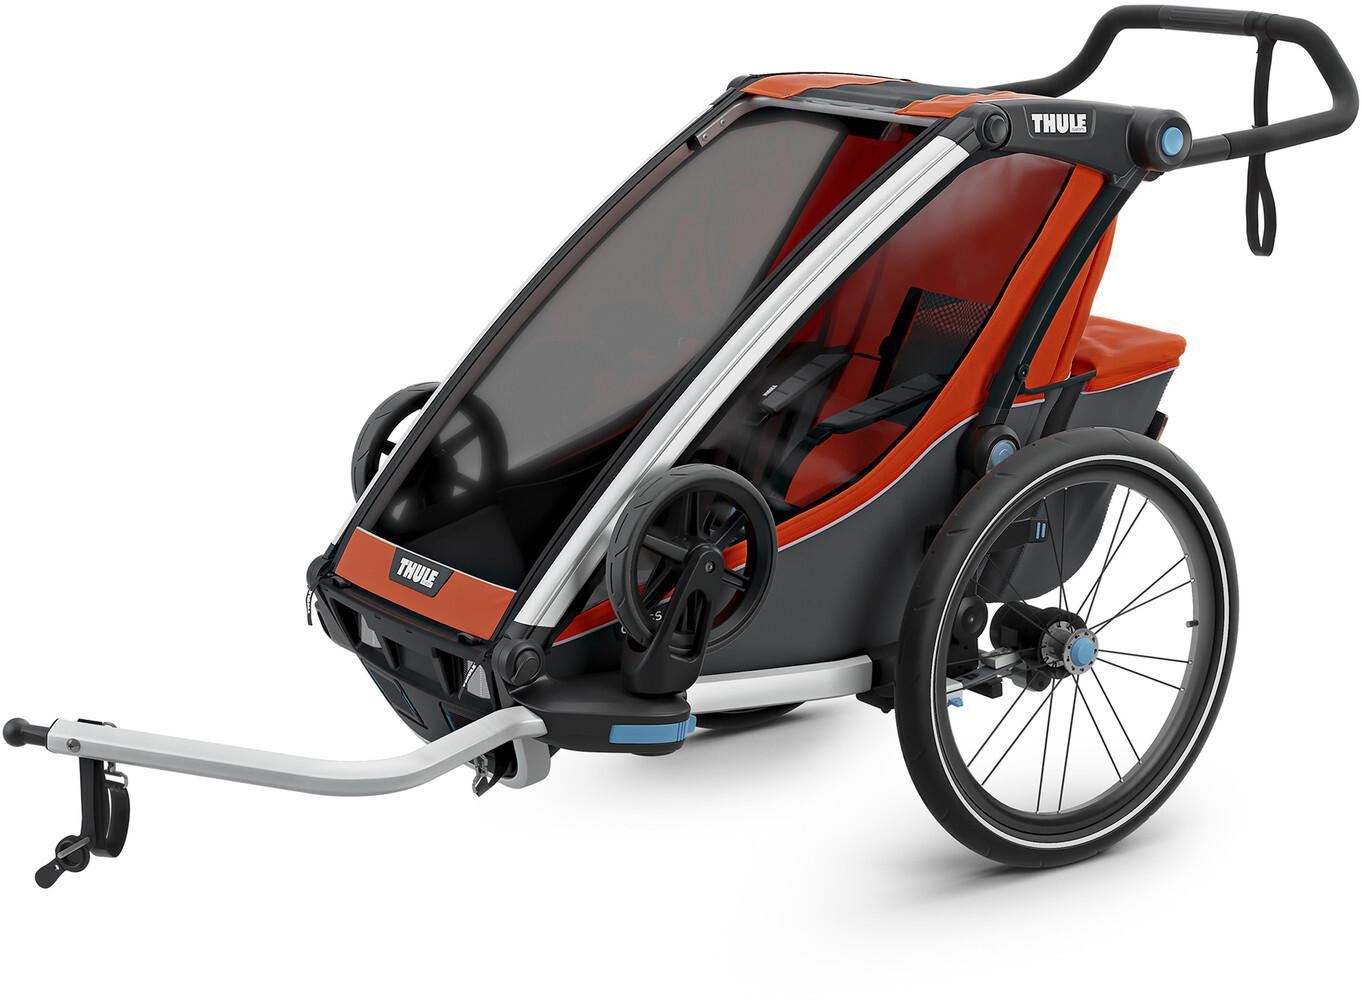 Thule Chariot Cross 1 Cykelanhænger, roarange/dark shadow | Trailer til cykler